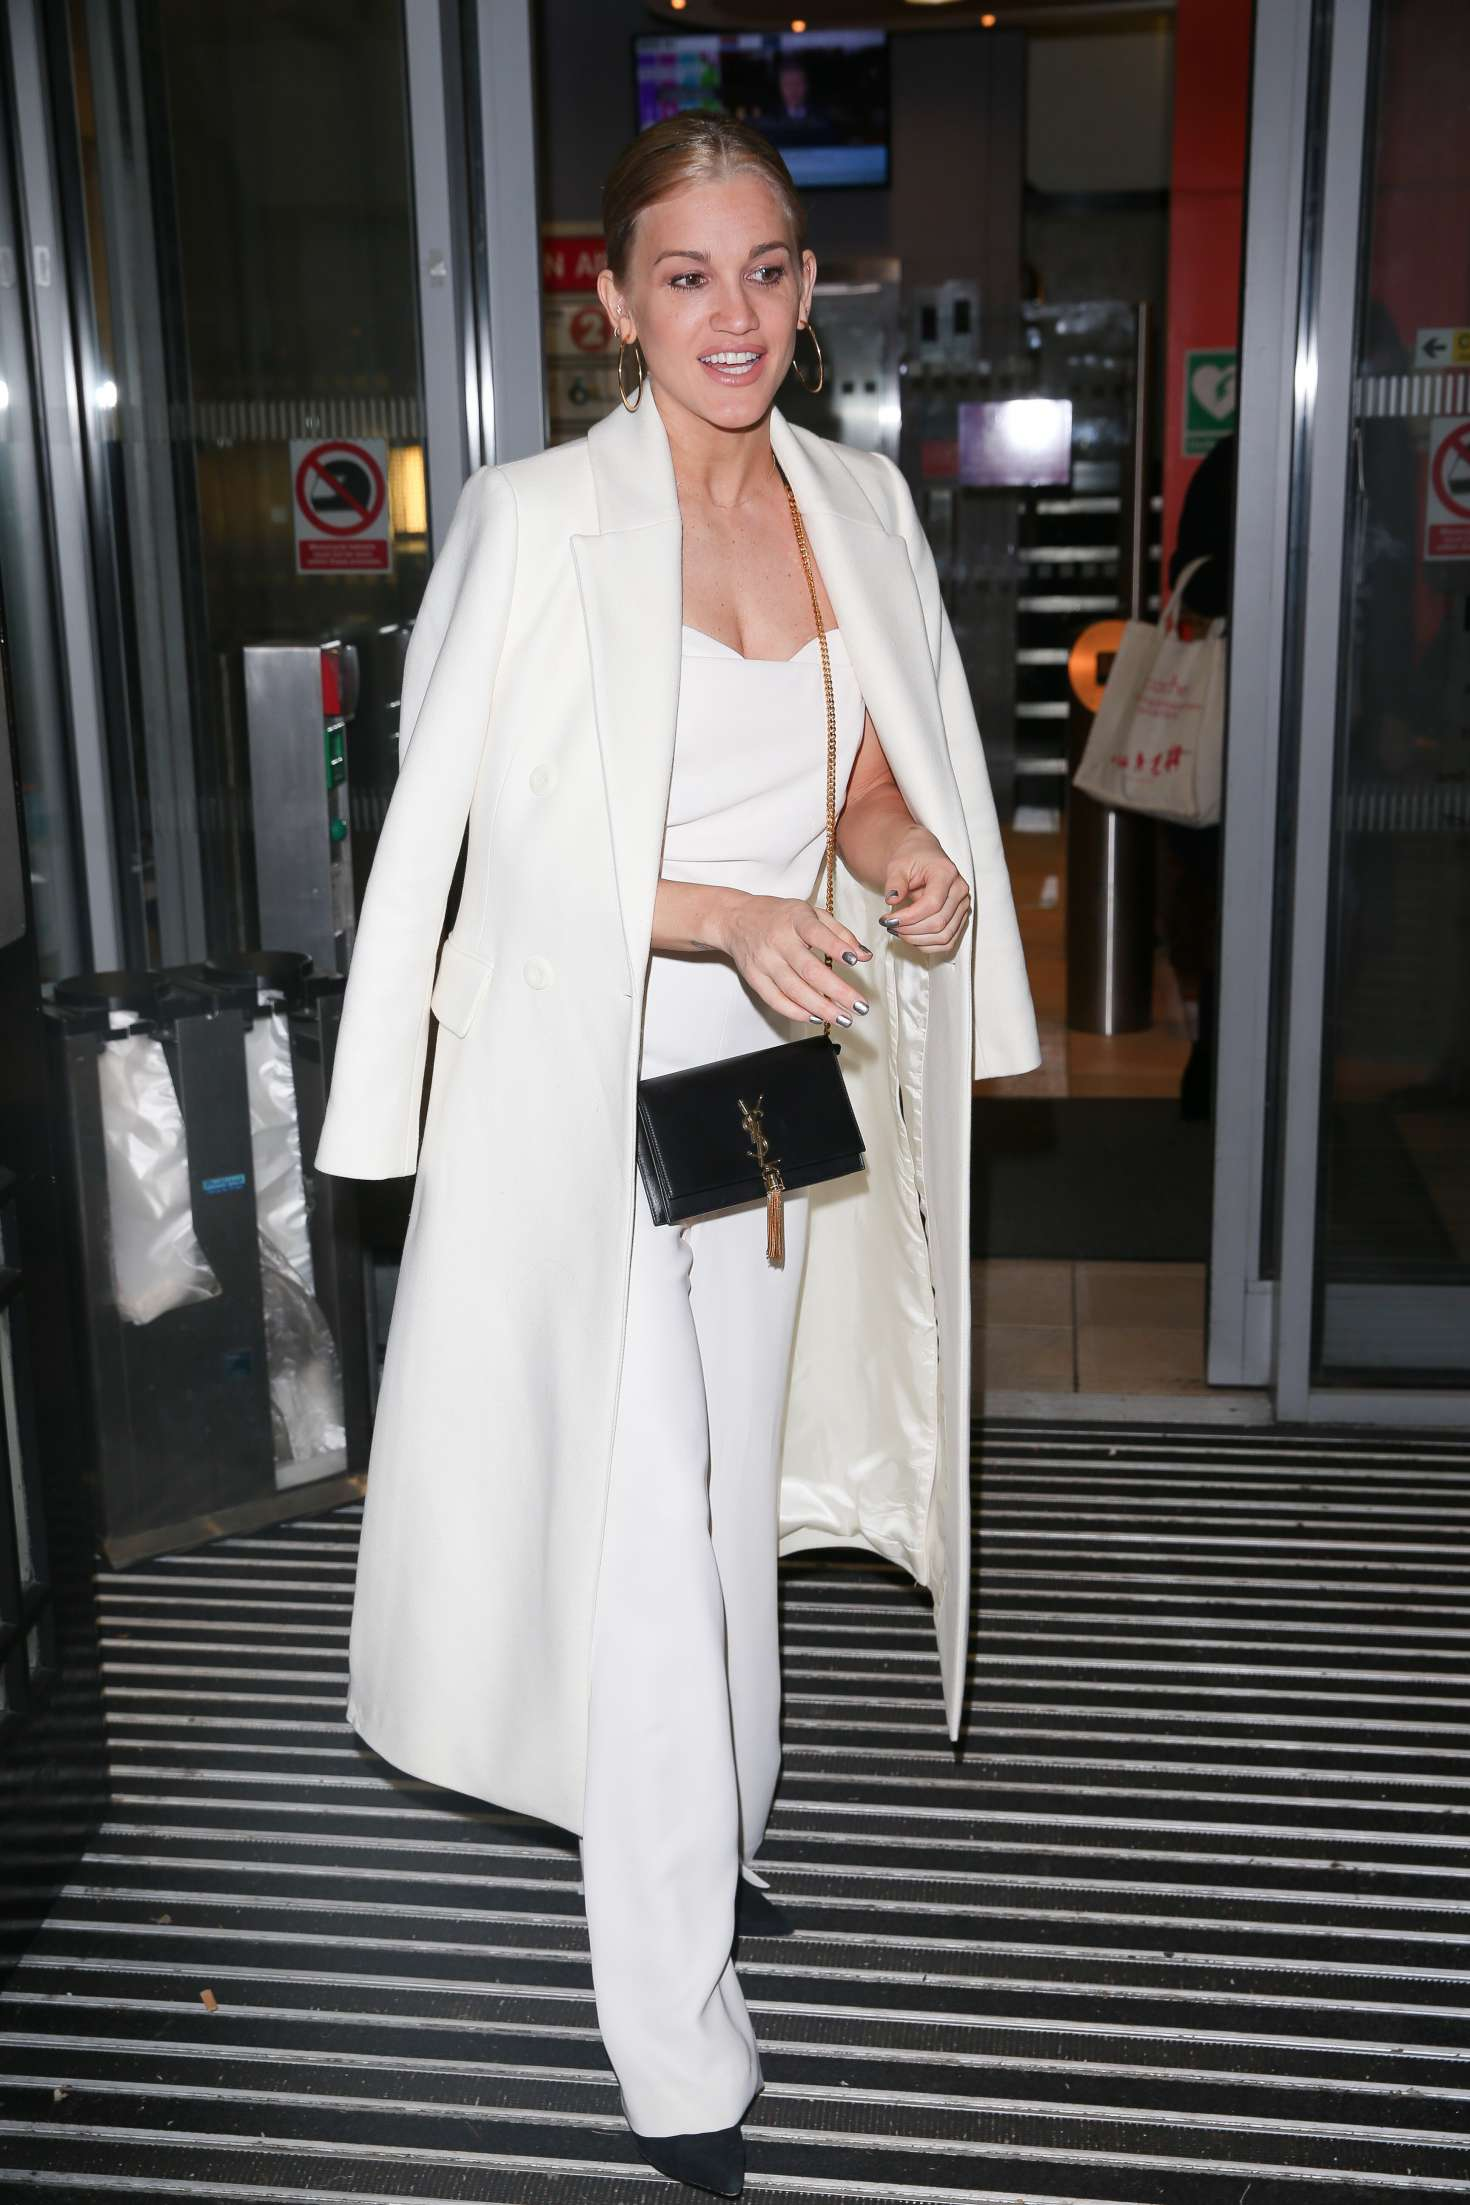 Ashley Roberts 2018 : Ashley Roberts: Arriving on Chris Evans Breakfast Show -02